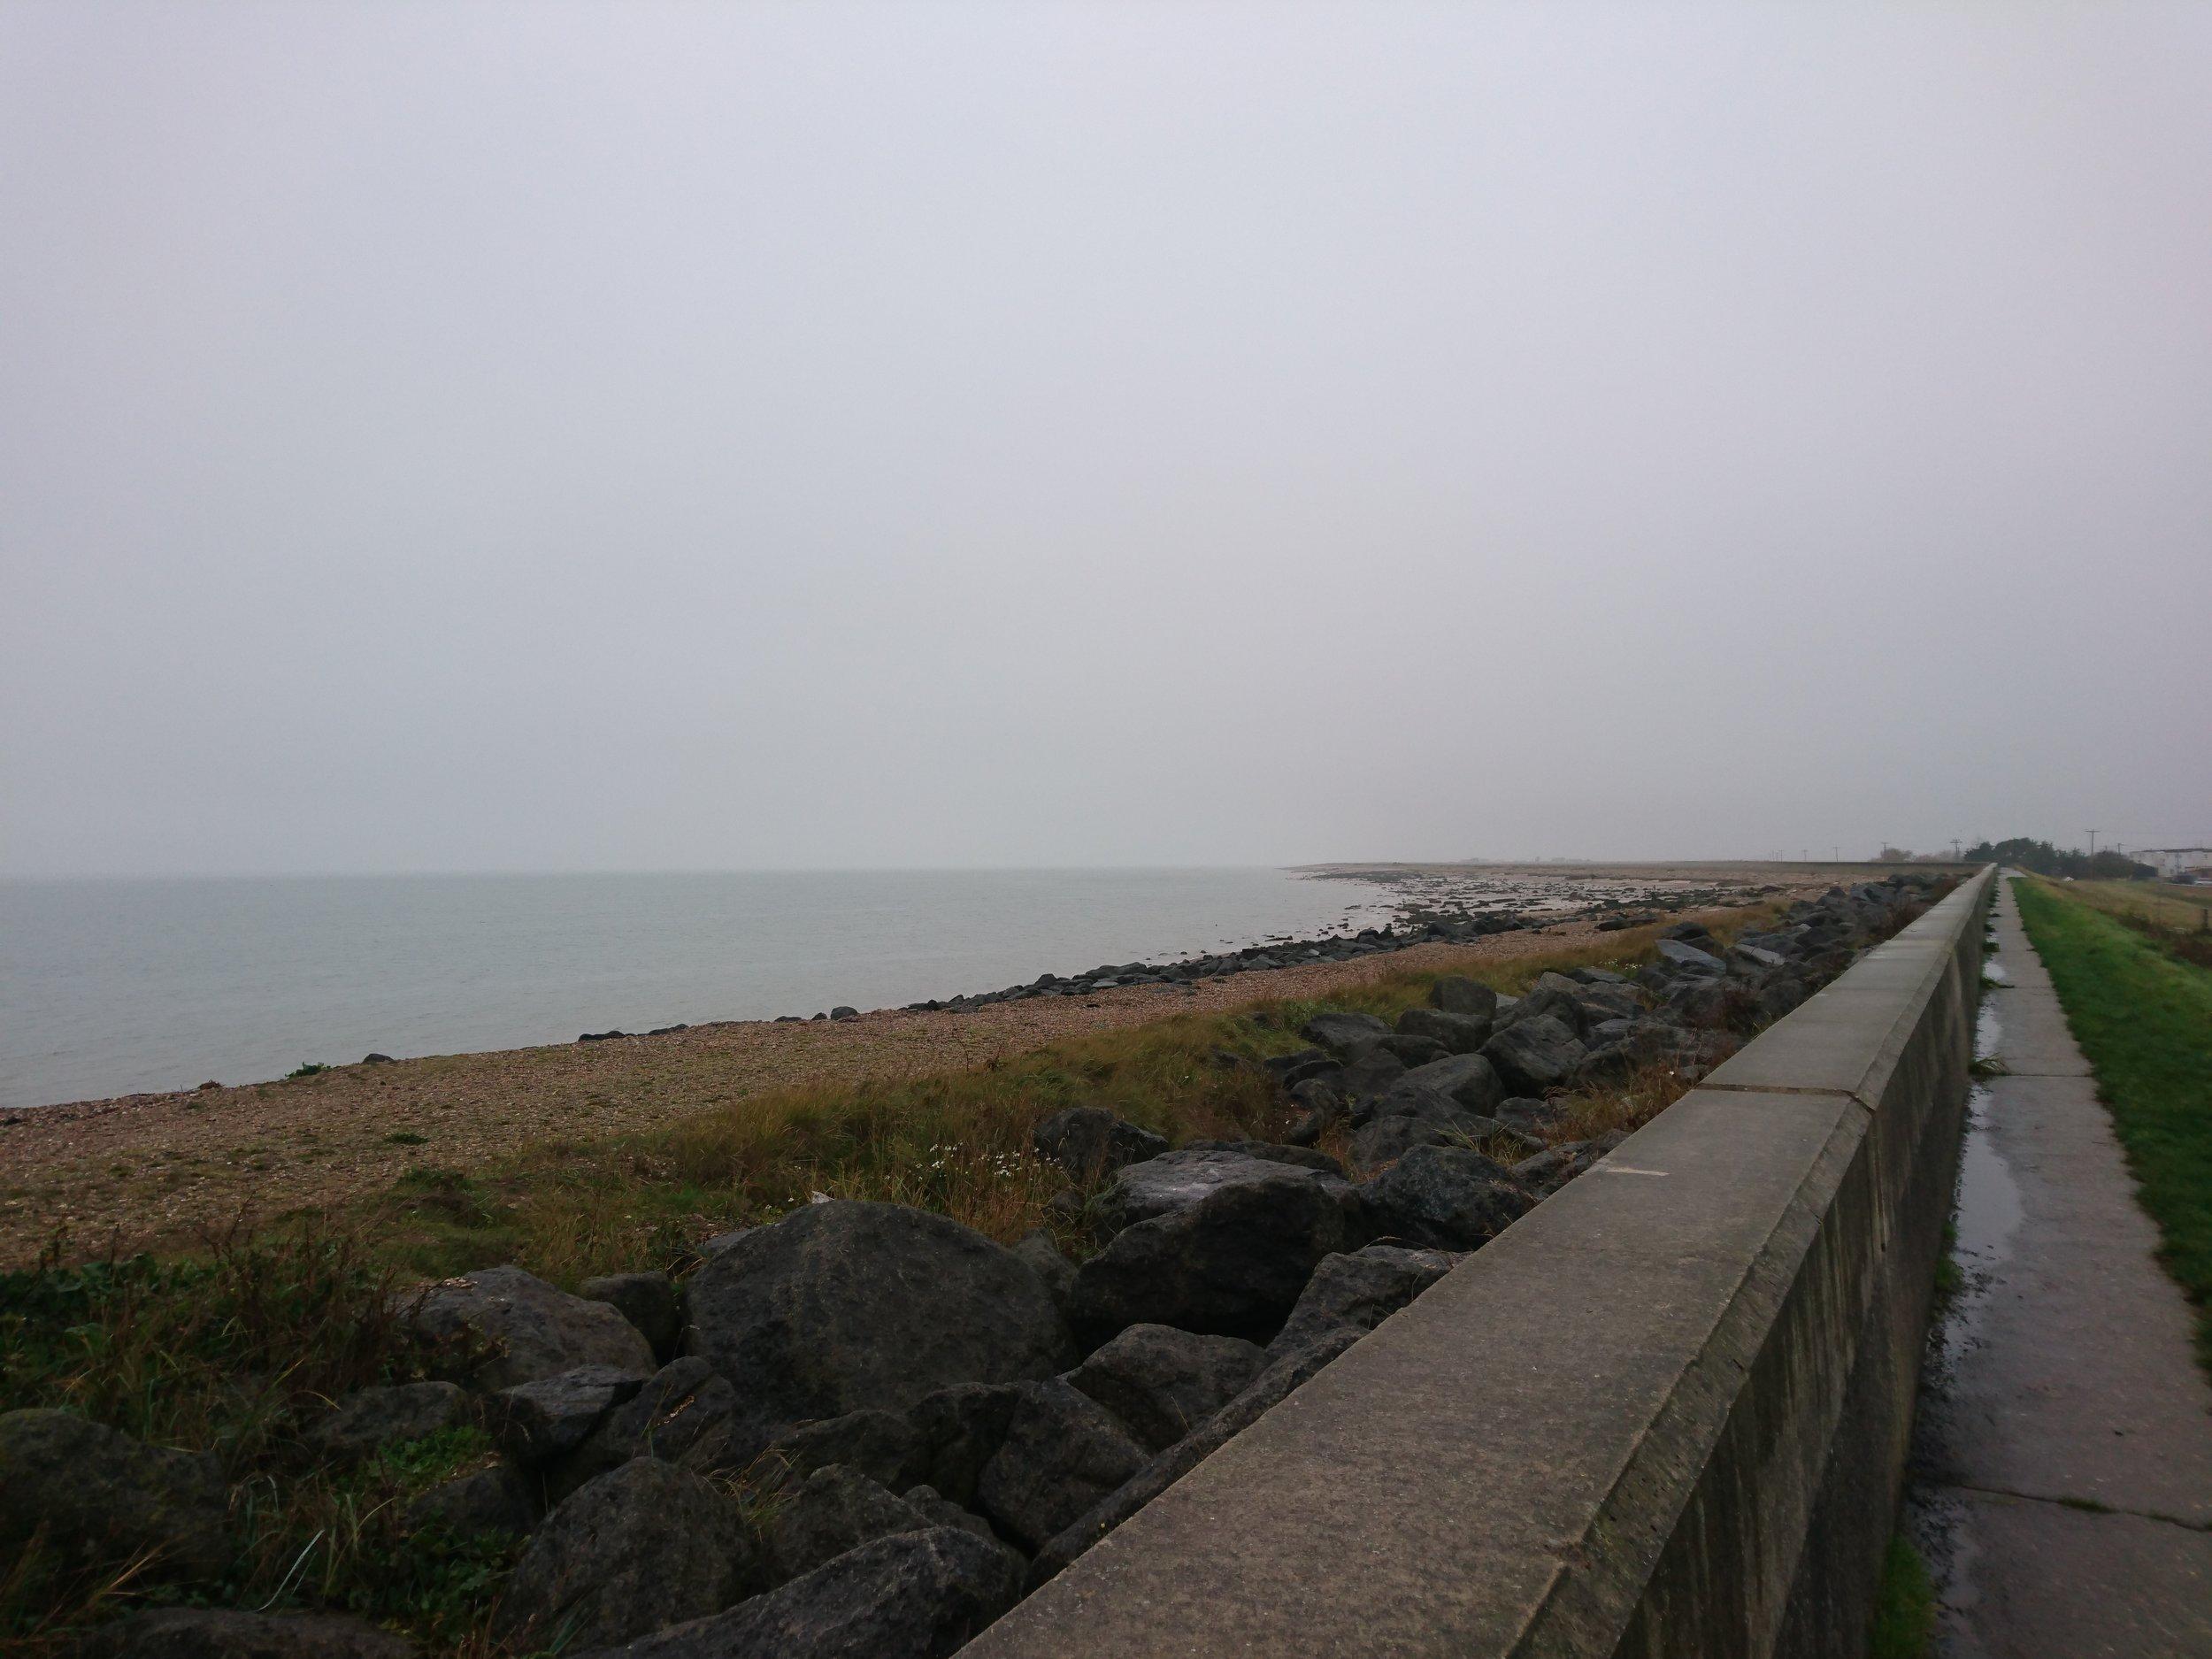 Sea Wall near Jaywick